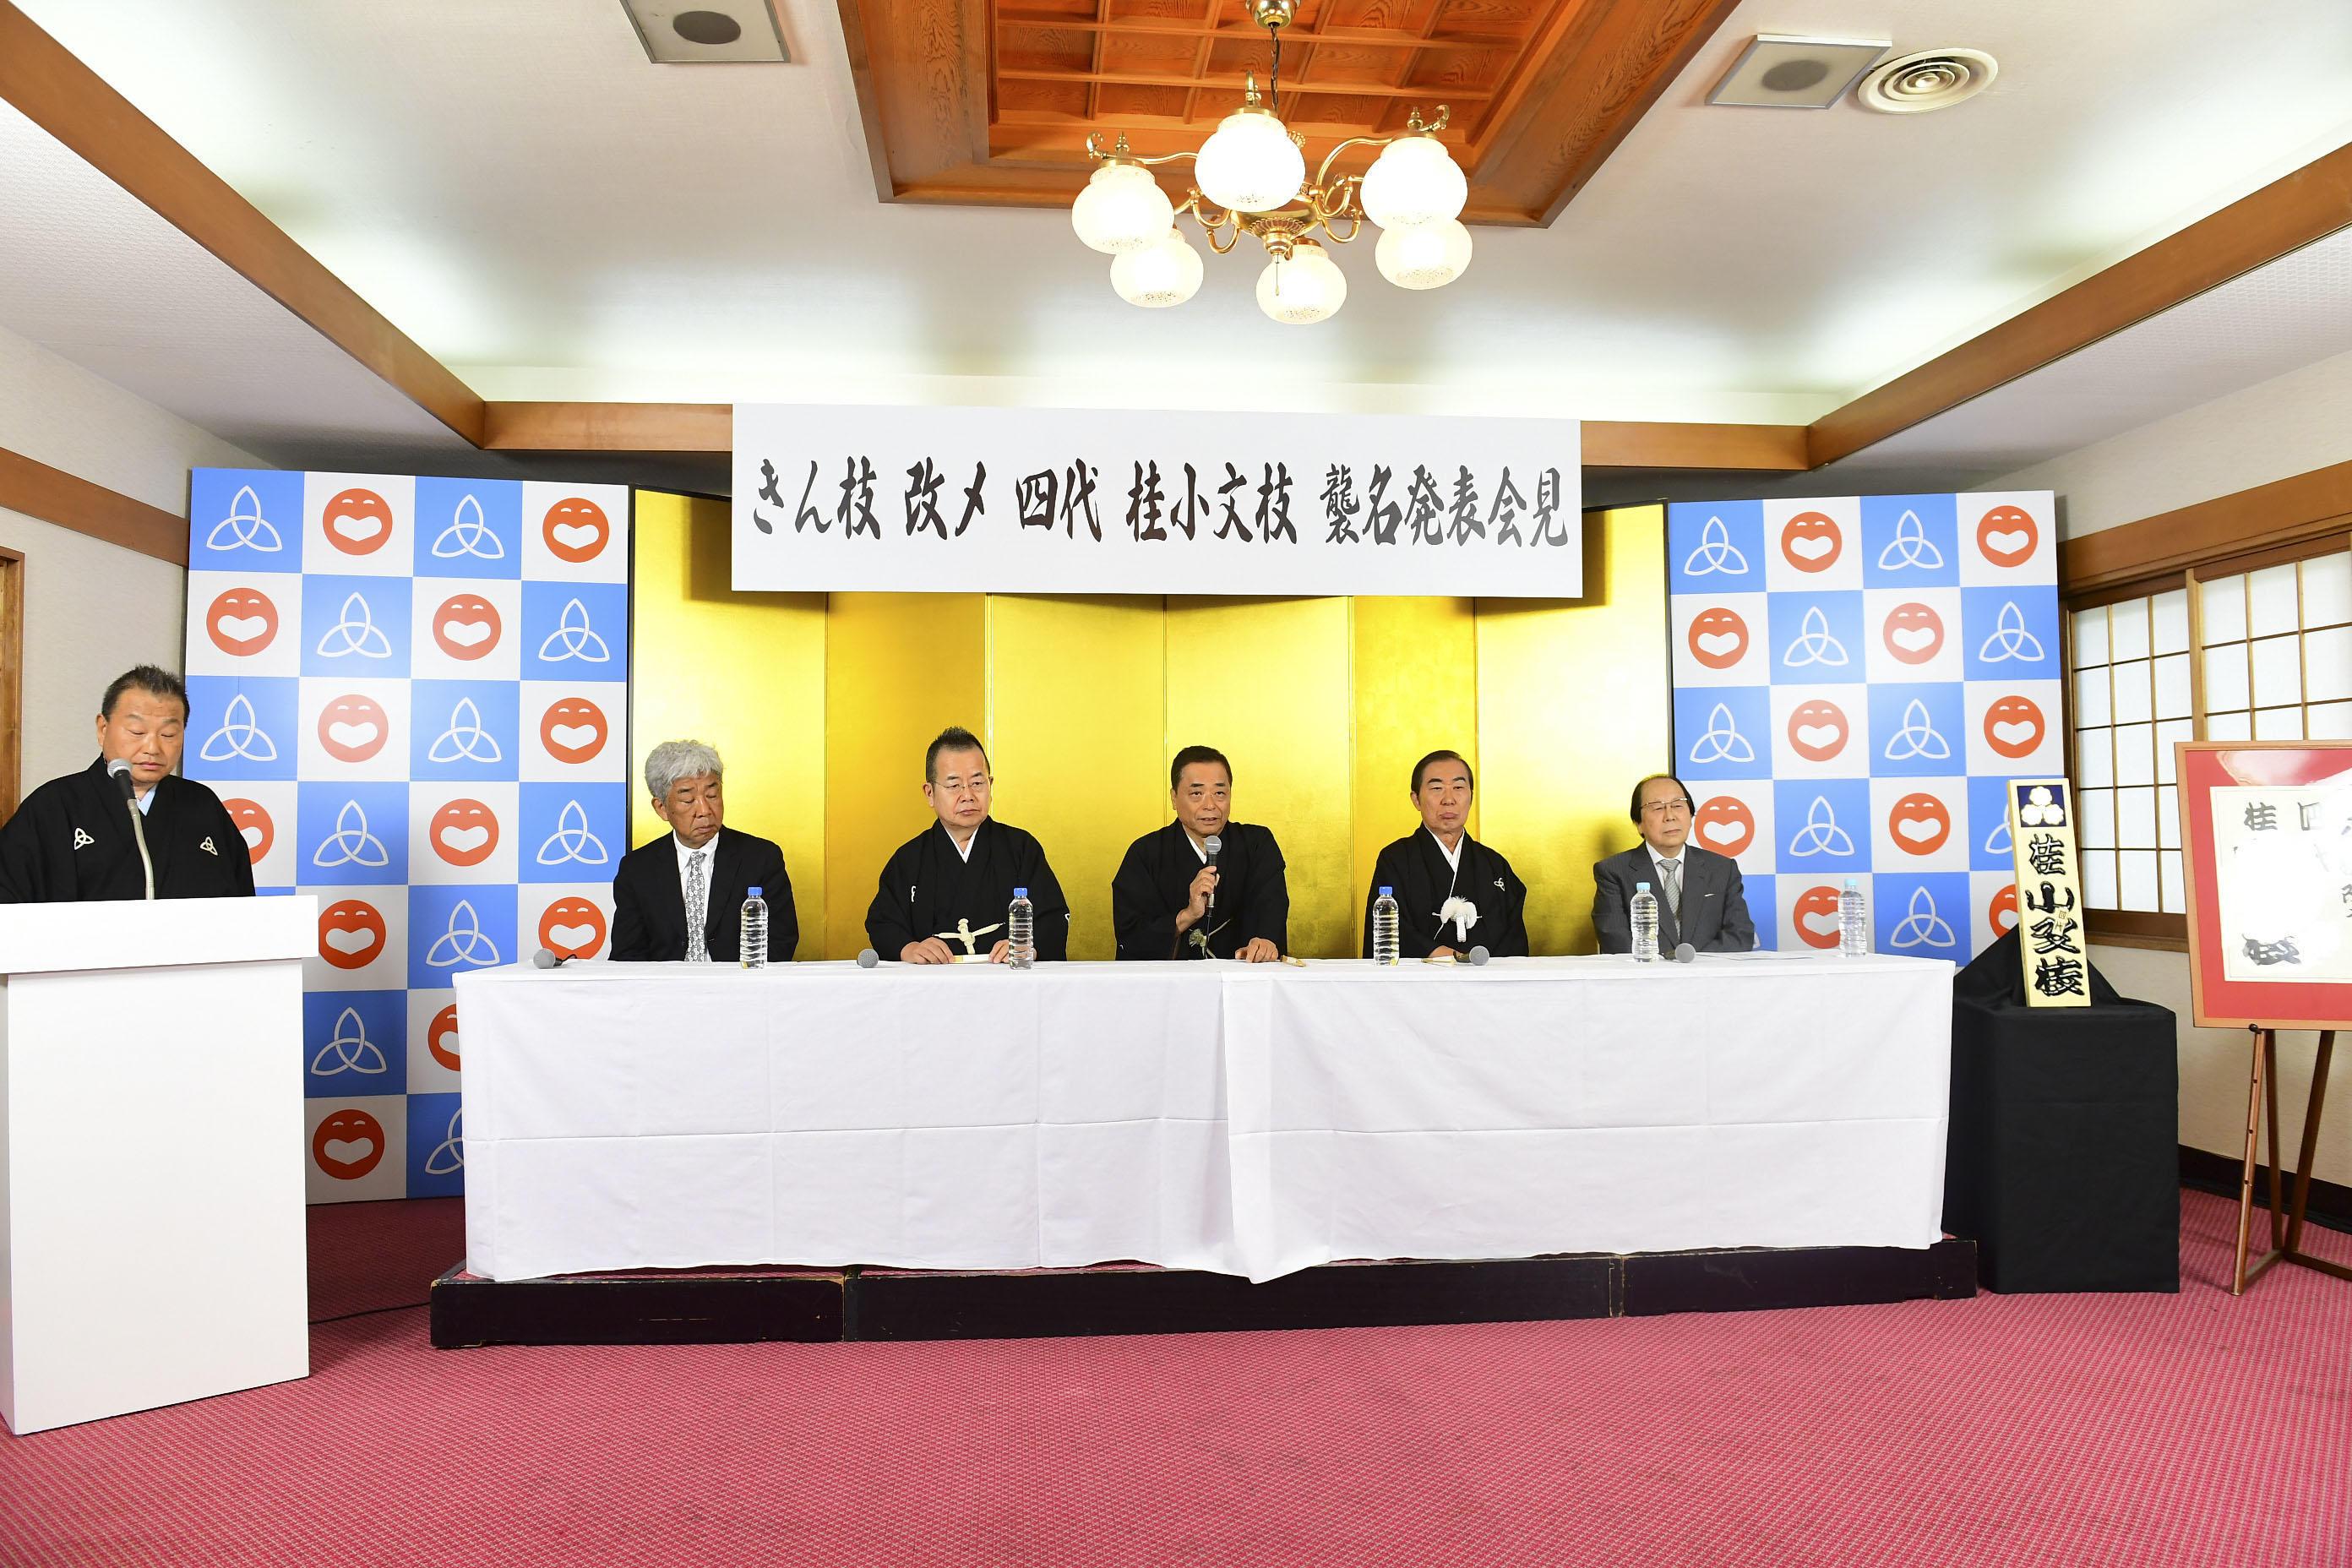 http://news.yoshimoto.co.jp/20170904165618-611b320f977ccf126dad6695fcafa030d47e5a4e.jpg